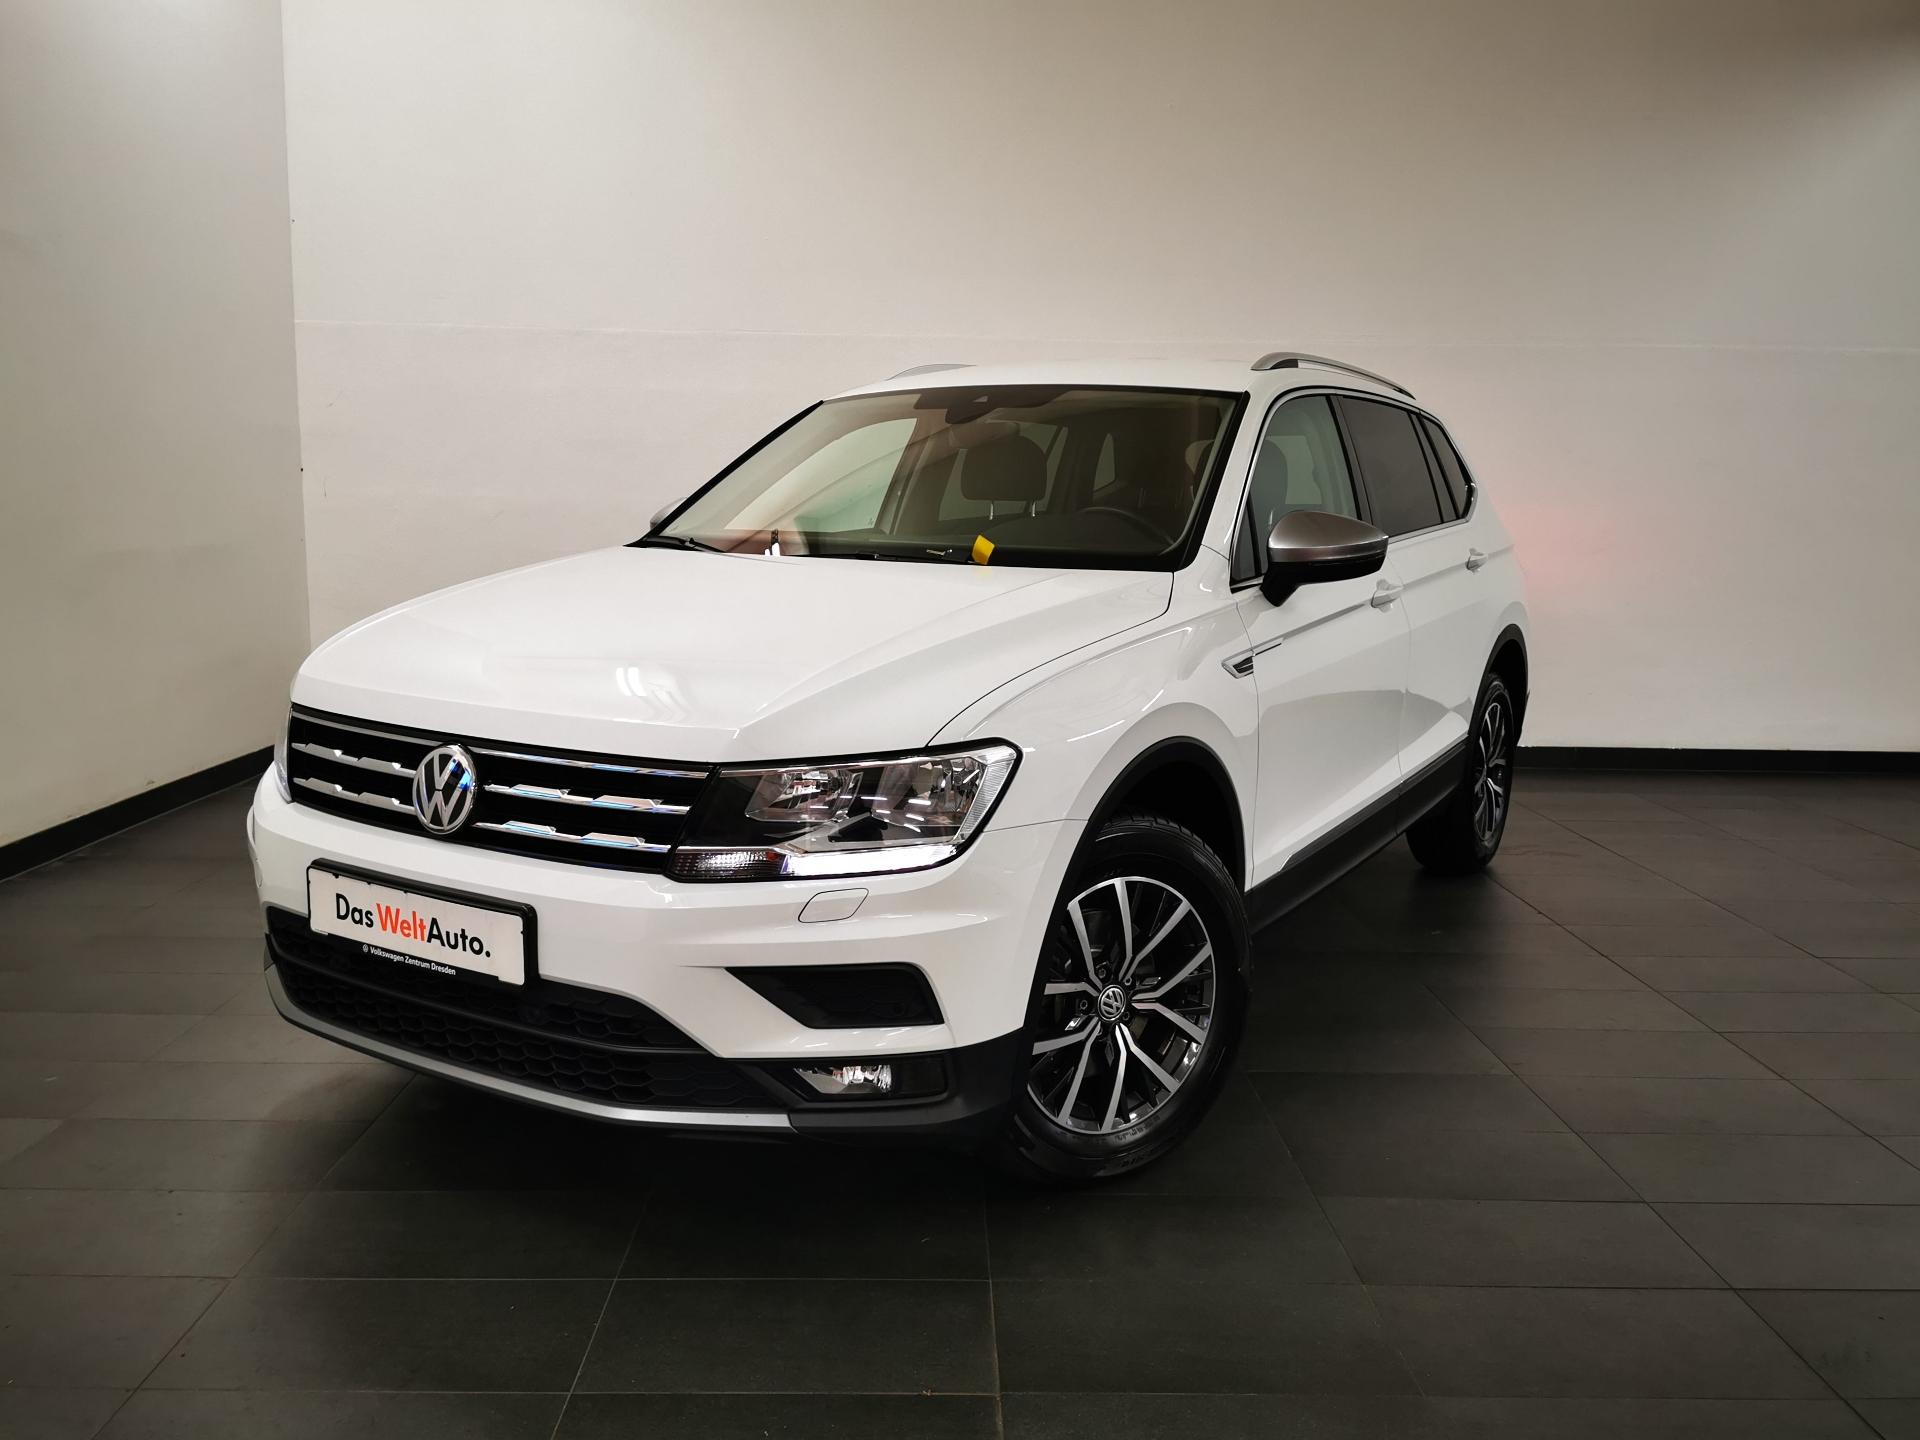 Volkswagen Tiguan Allspace Comfortline 2,0 TDI ACC 2,99%, Jahr 2018, Diesel